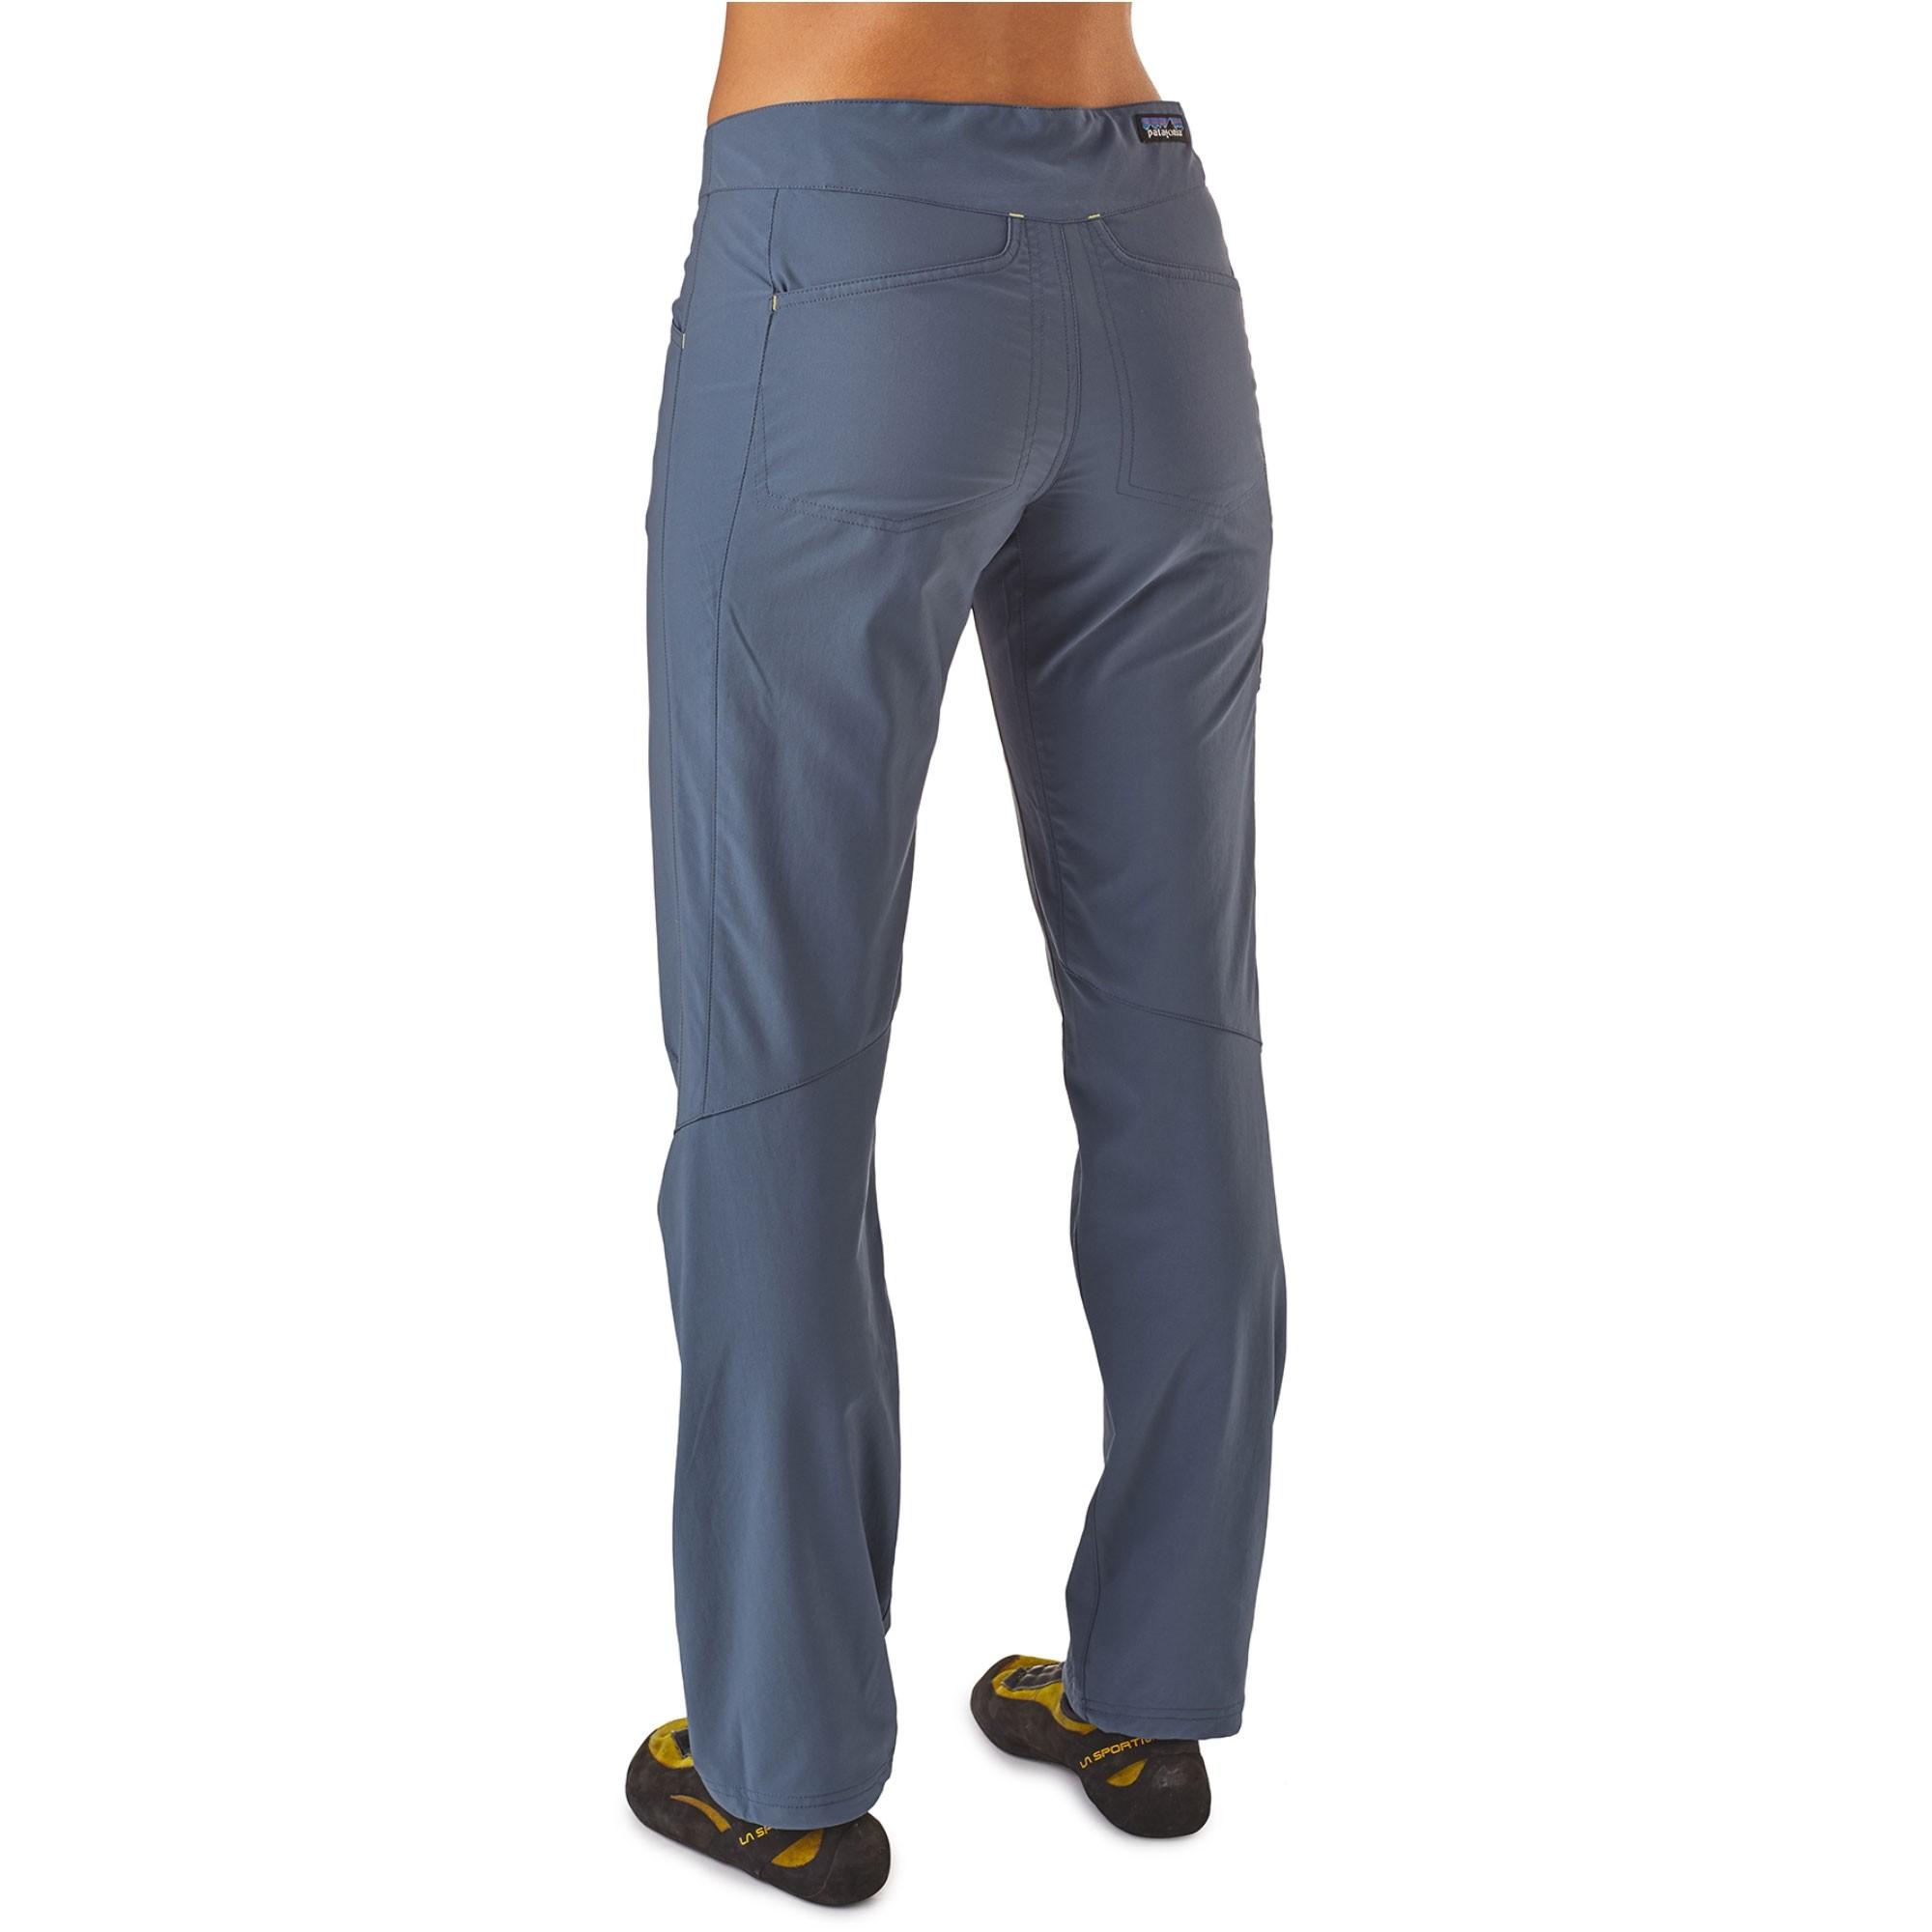 Patagonia-RPS-Rock-Pants-Womens-Dolomite-Blue-OM2-S18